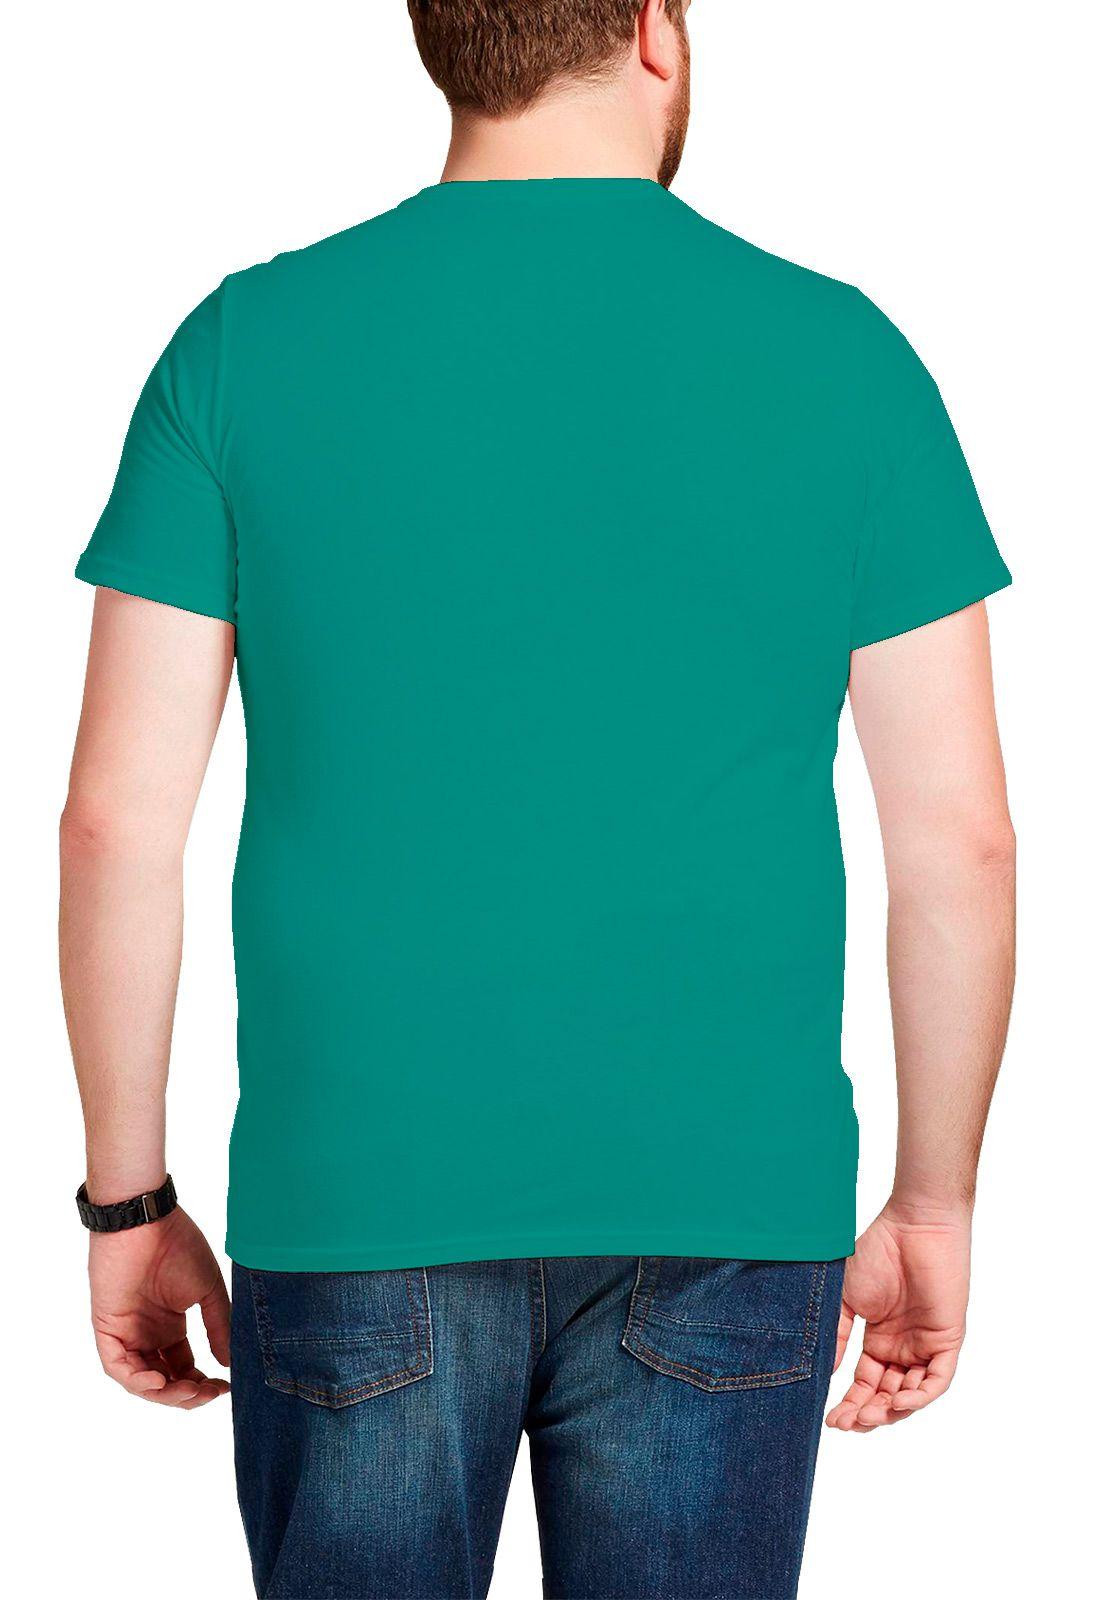 Camiseta Amazônia Bike Respect - Azul